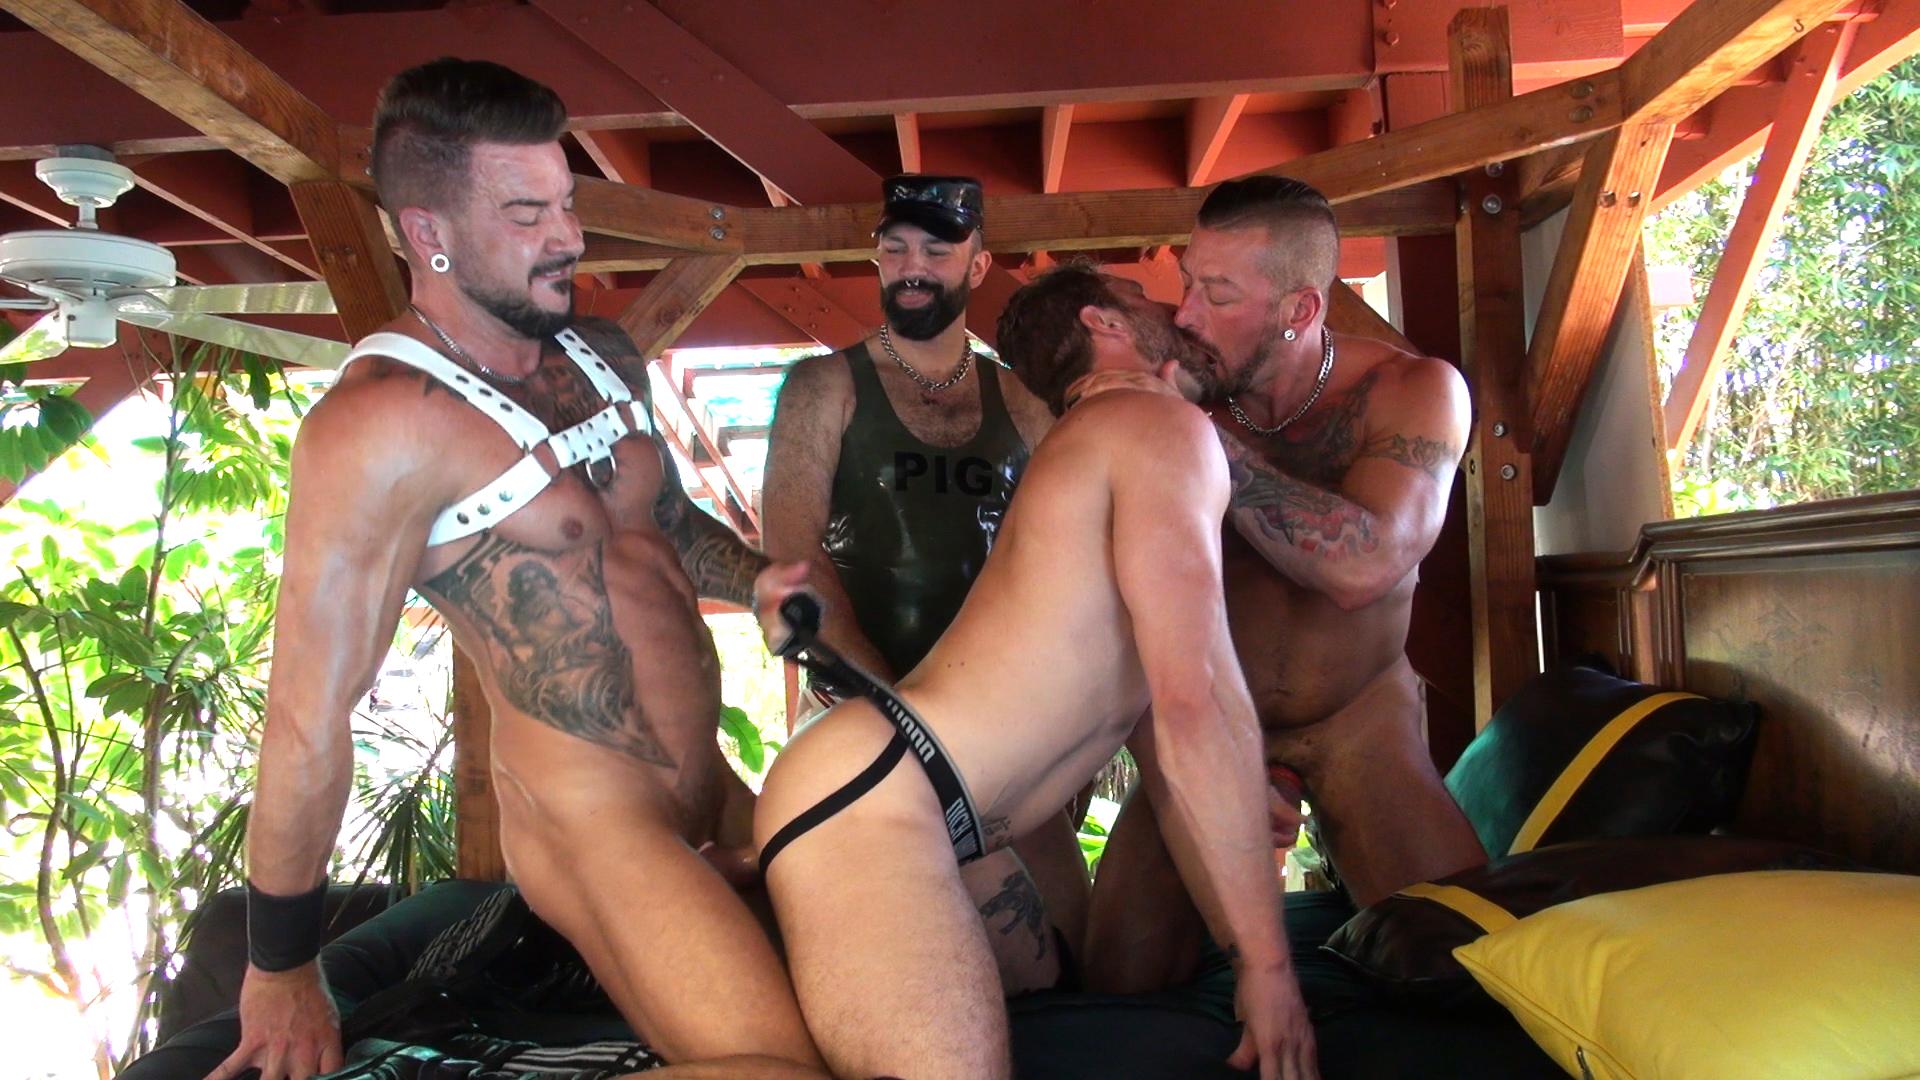 Ace Era Gay Porn Star Free Videos ace era, boy fillmore, dolf dietrich & hugh hunter - gay - pound